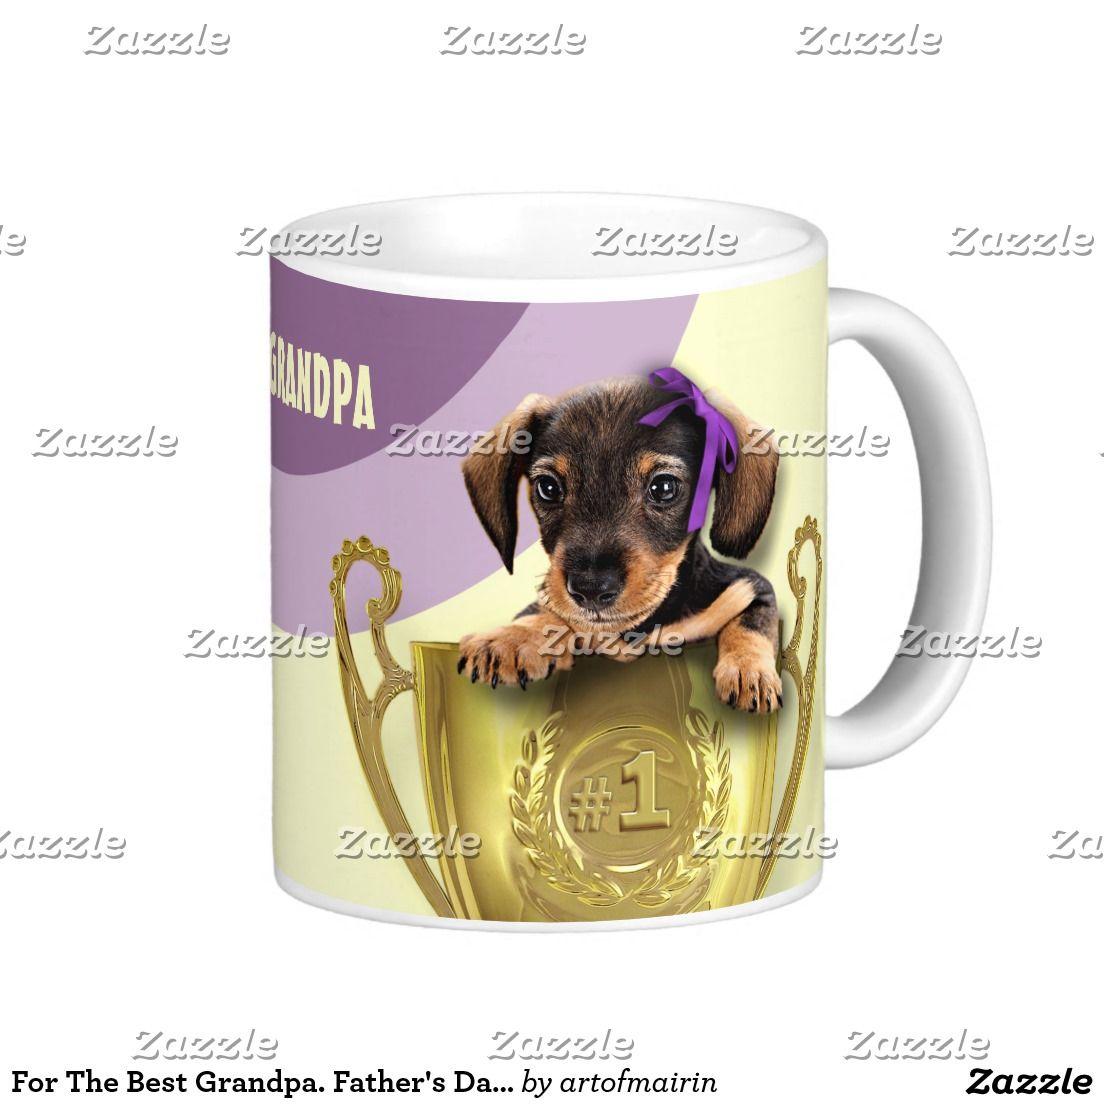 For the best grandpa funny puppy design fatherus day birthday